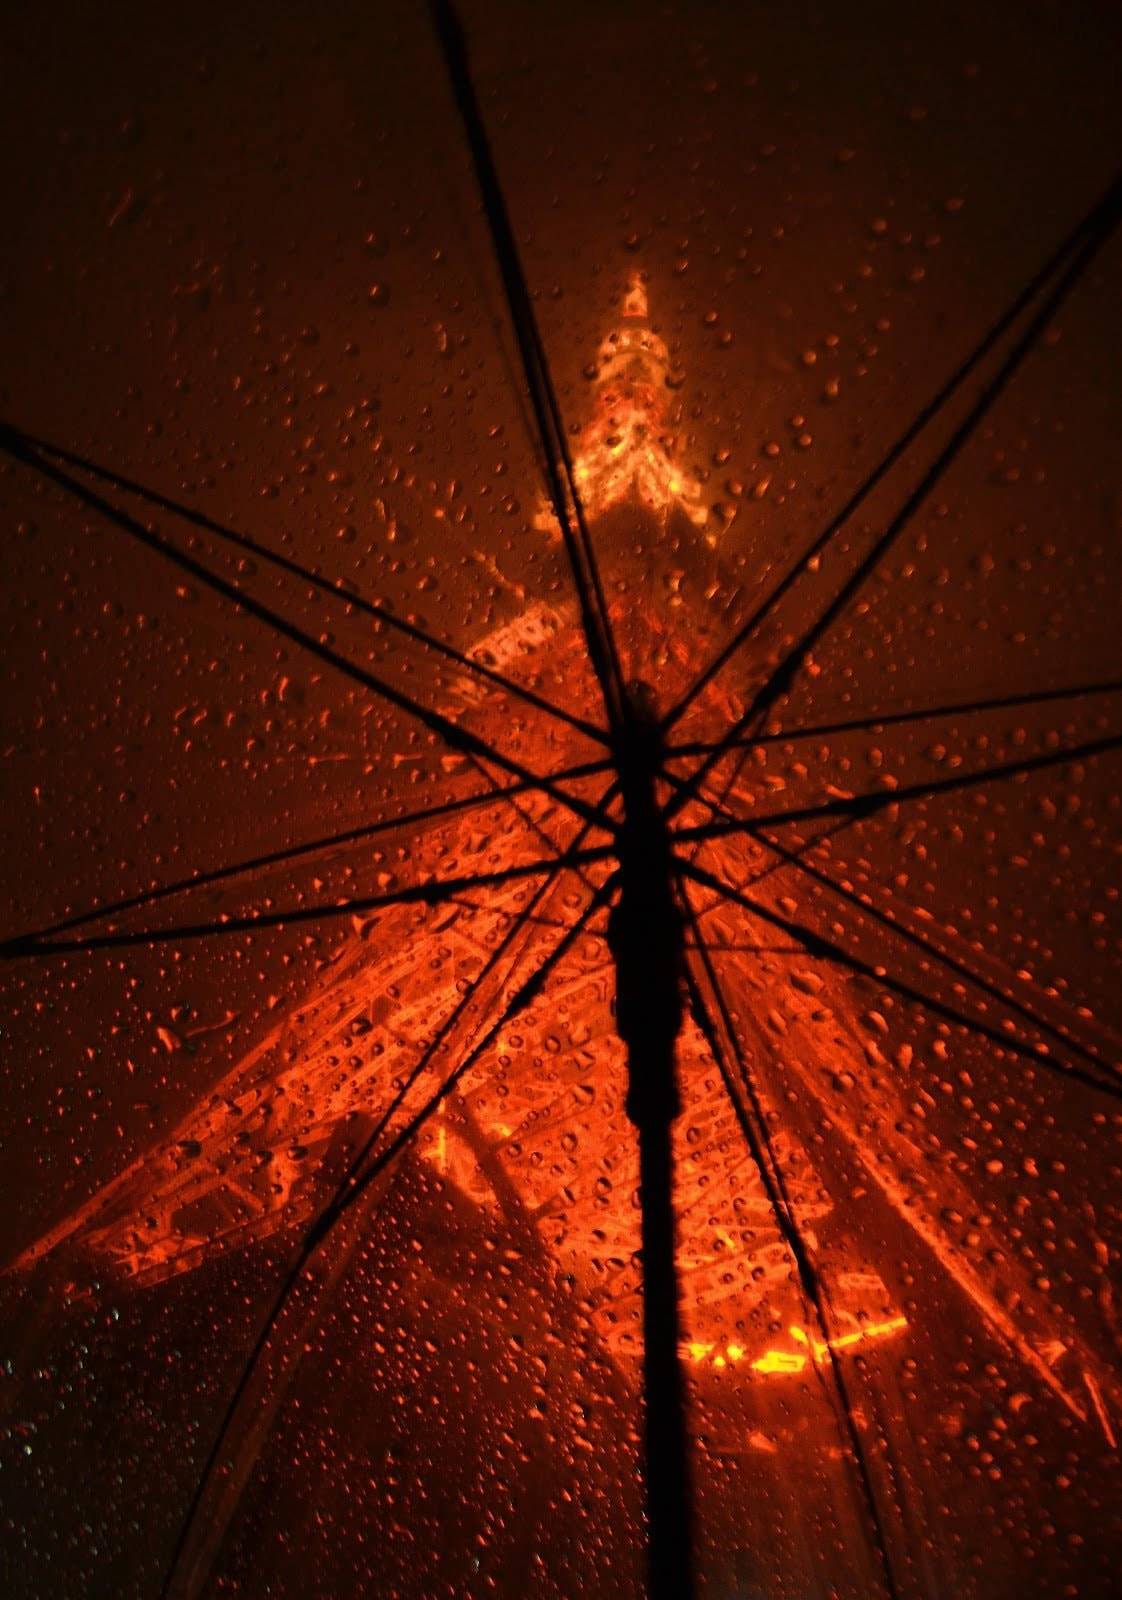 Tokyo tower in the rain seen from under a translucent umbrella by Brenda Alvarez